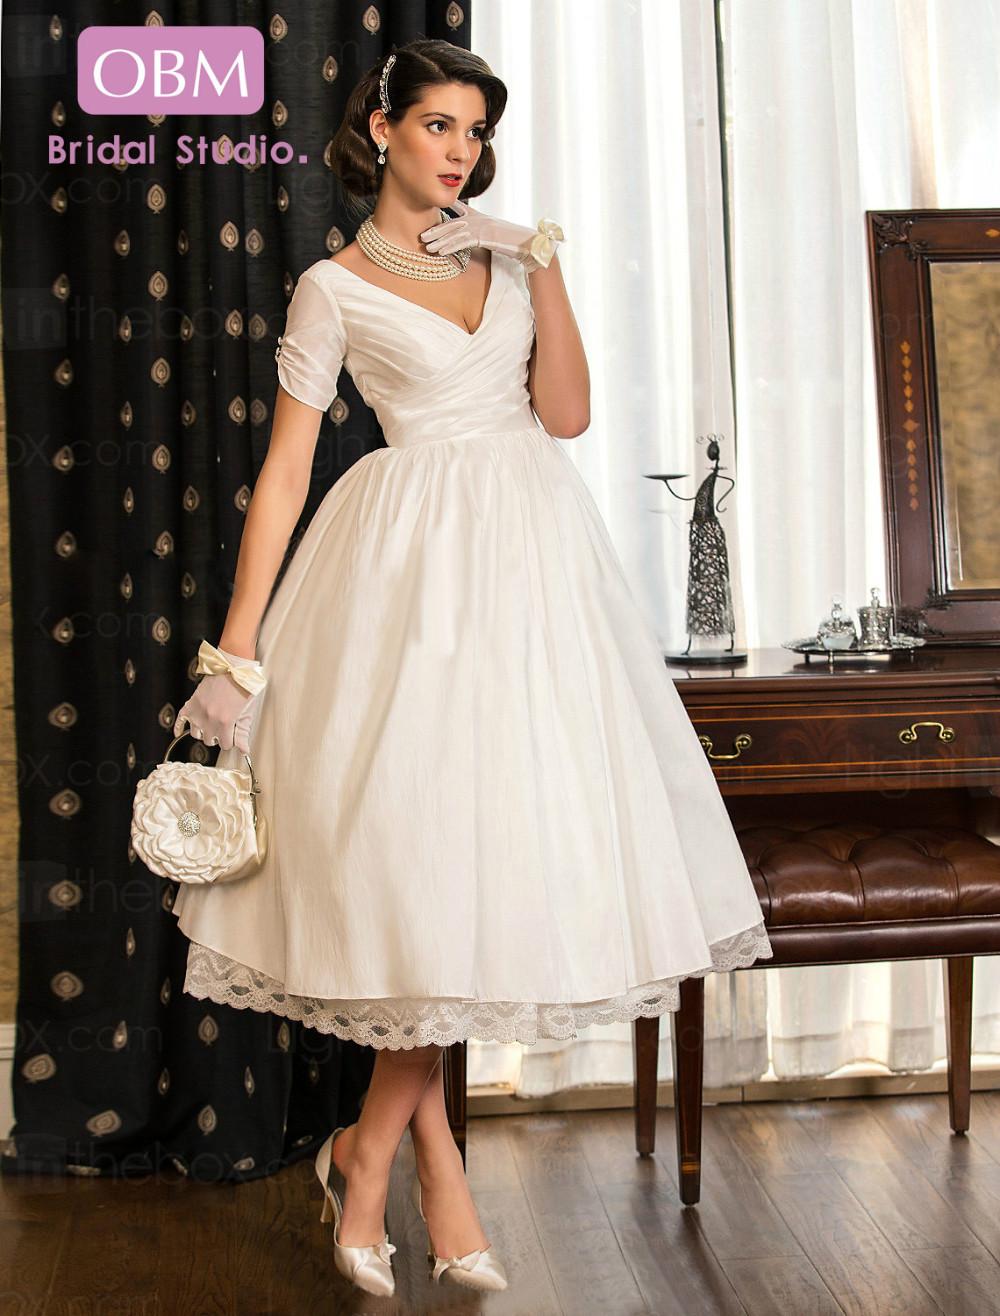 23 Top 45 Tea length Wedding Dress with Color t length wedding dresses Tea length Wedding Dress with Color